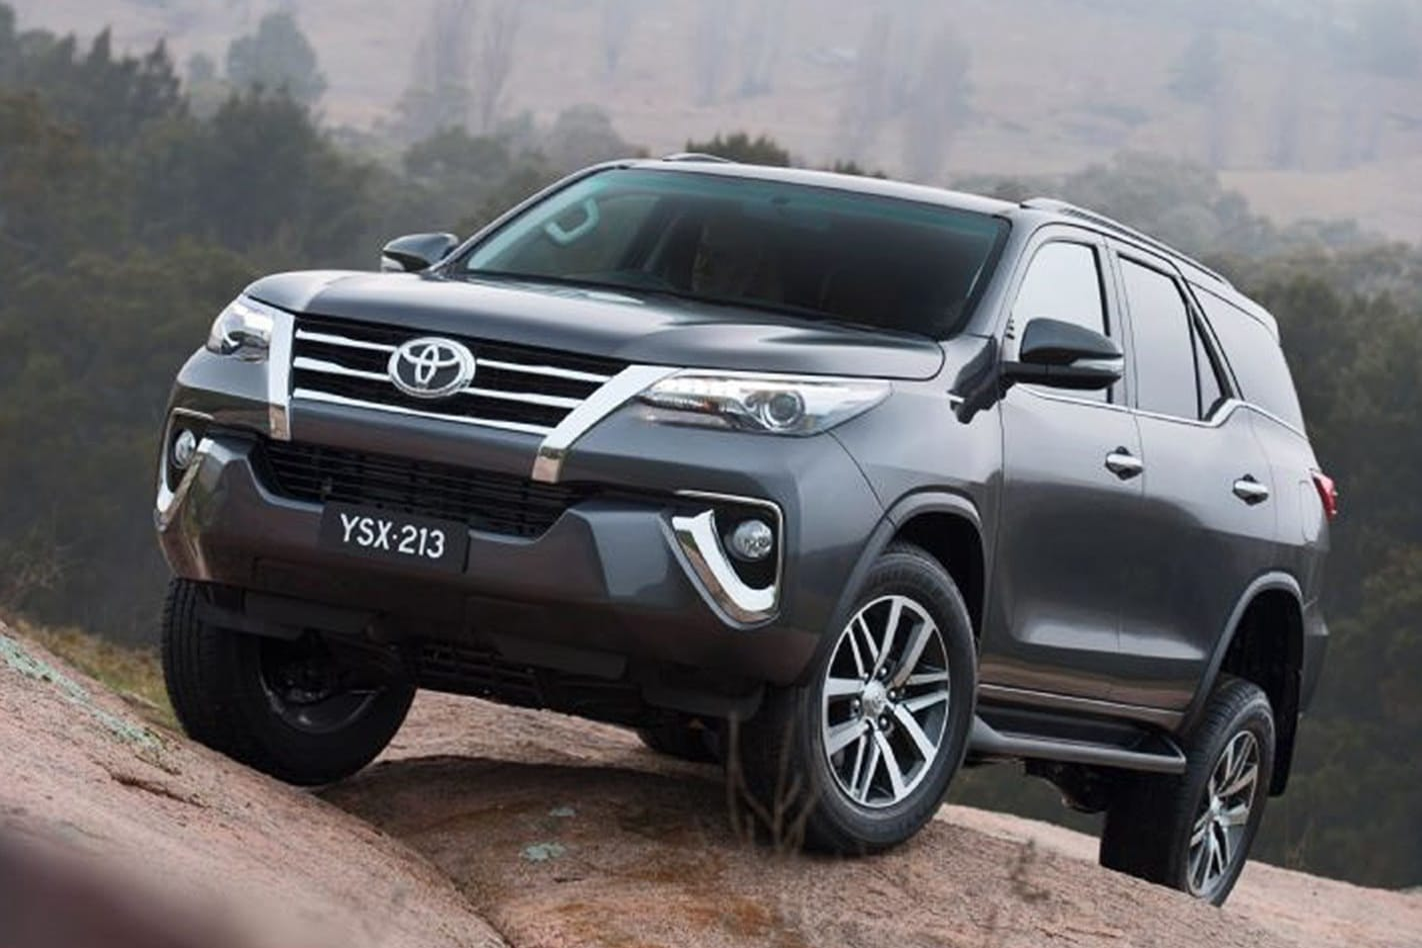 Toyota inequitable Luxury Car Tax